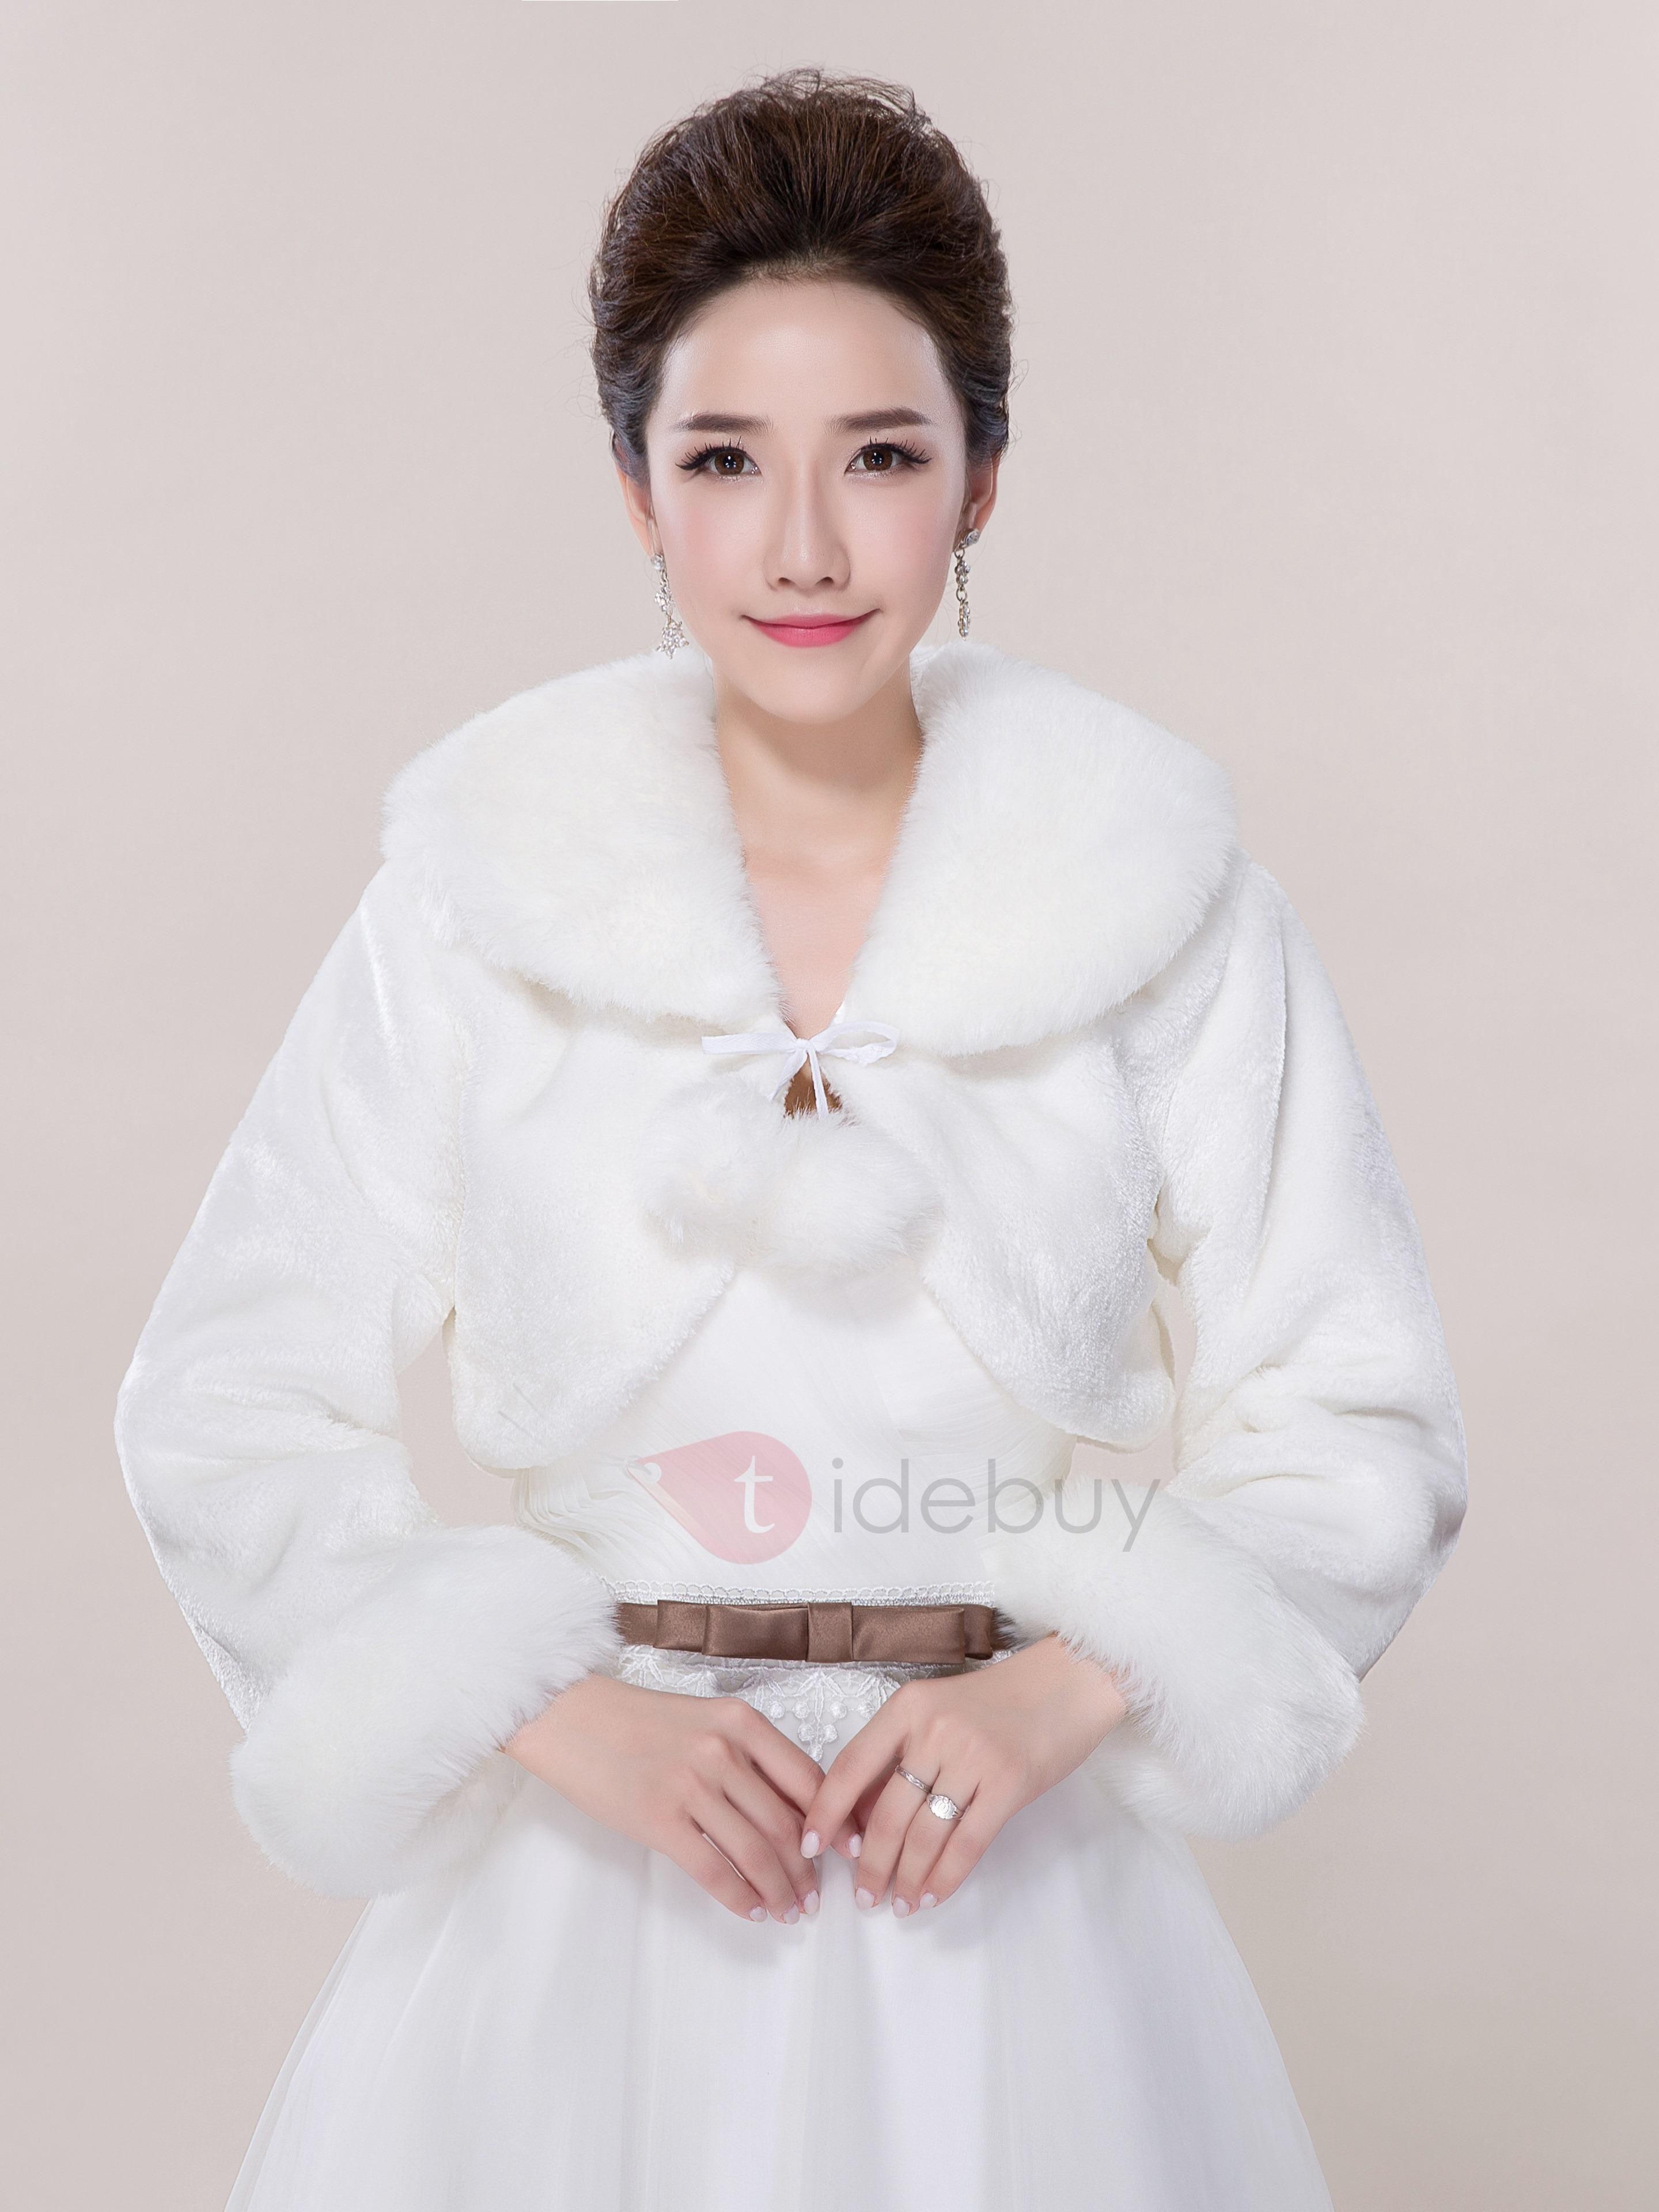 Fur wedding dress  TideBuy  TideBuy White Long Sleeve Faux Fur Wedding Jacket